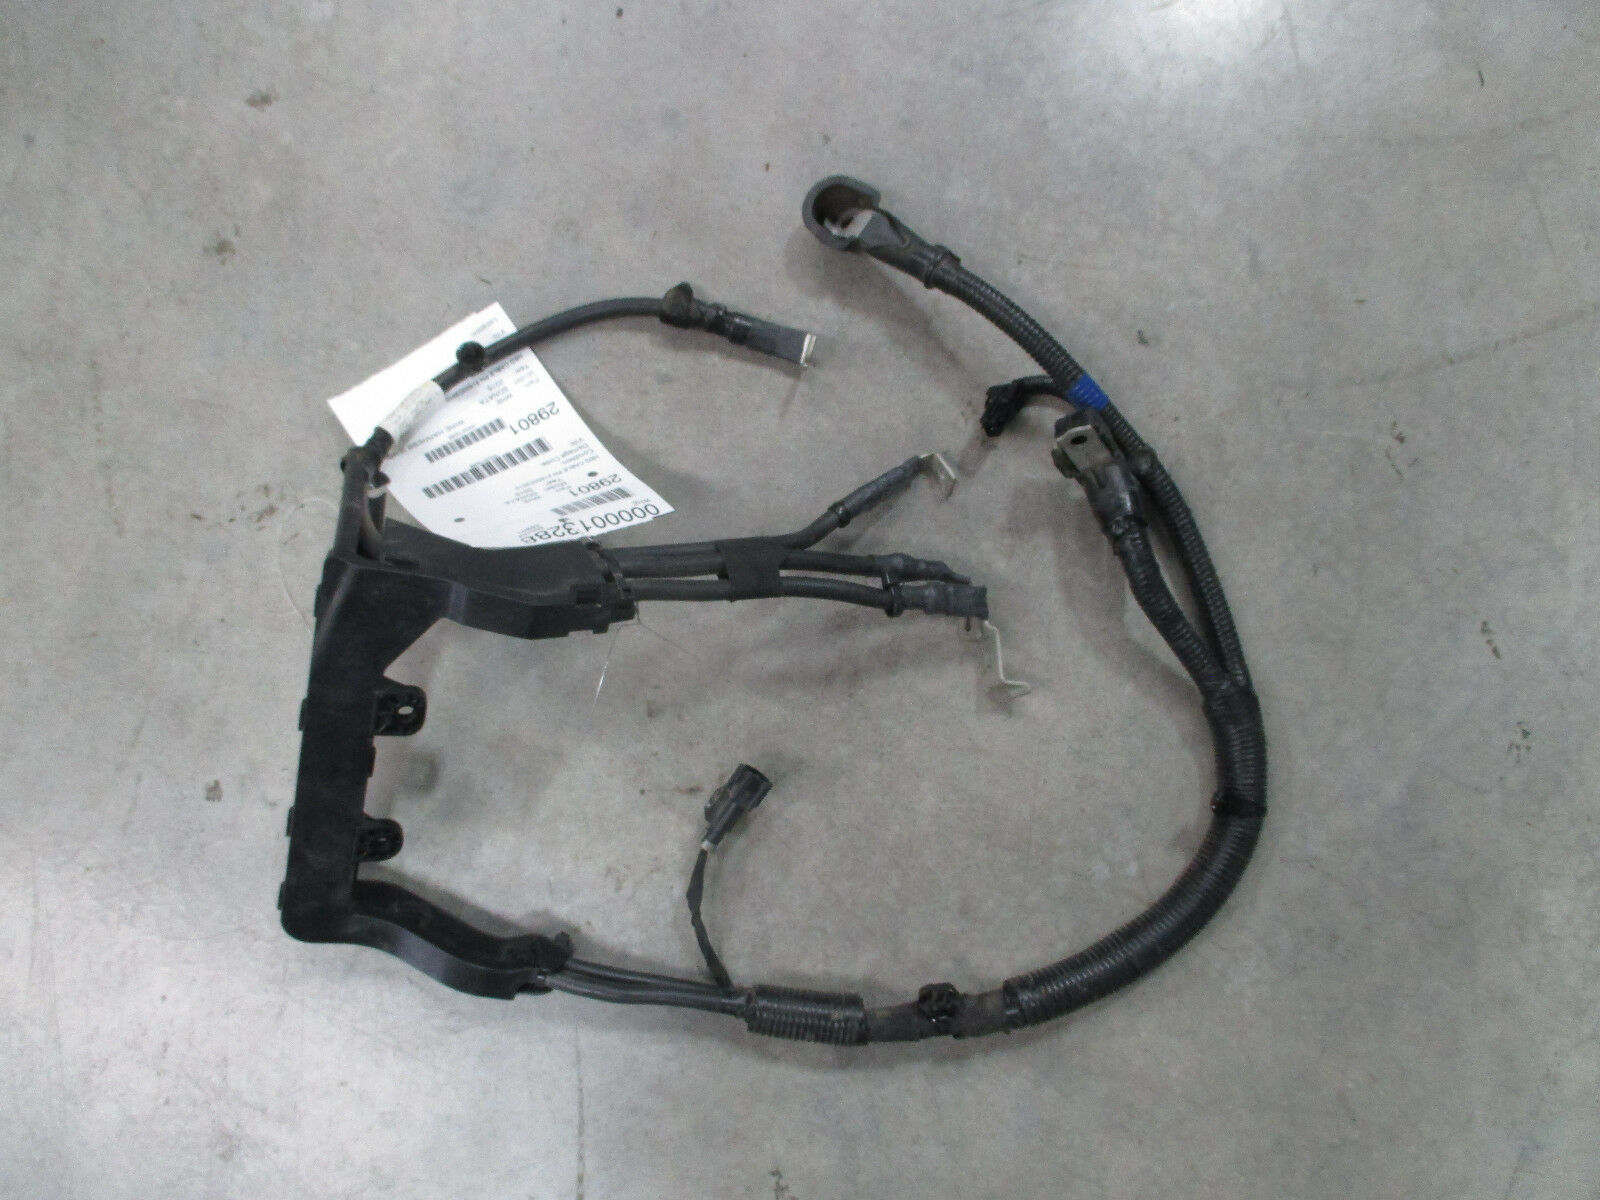 Genuine Hyundai 91815-3M073 Wiring Assembly